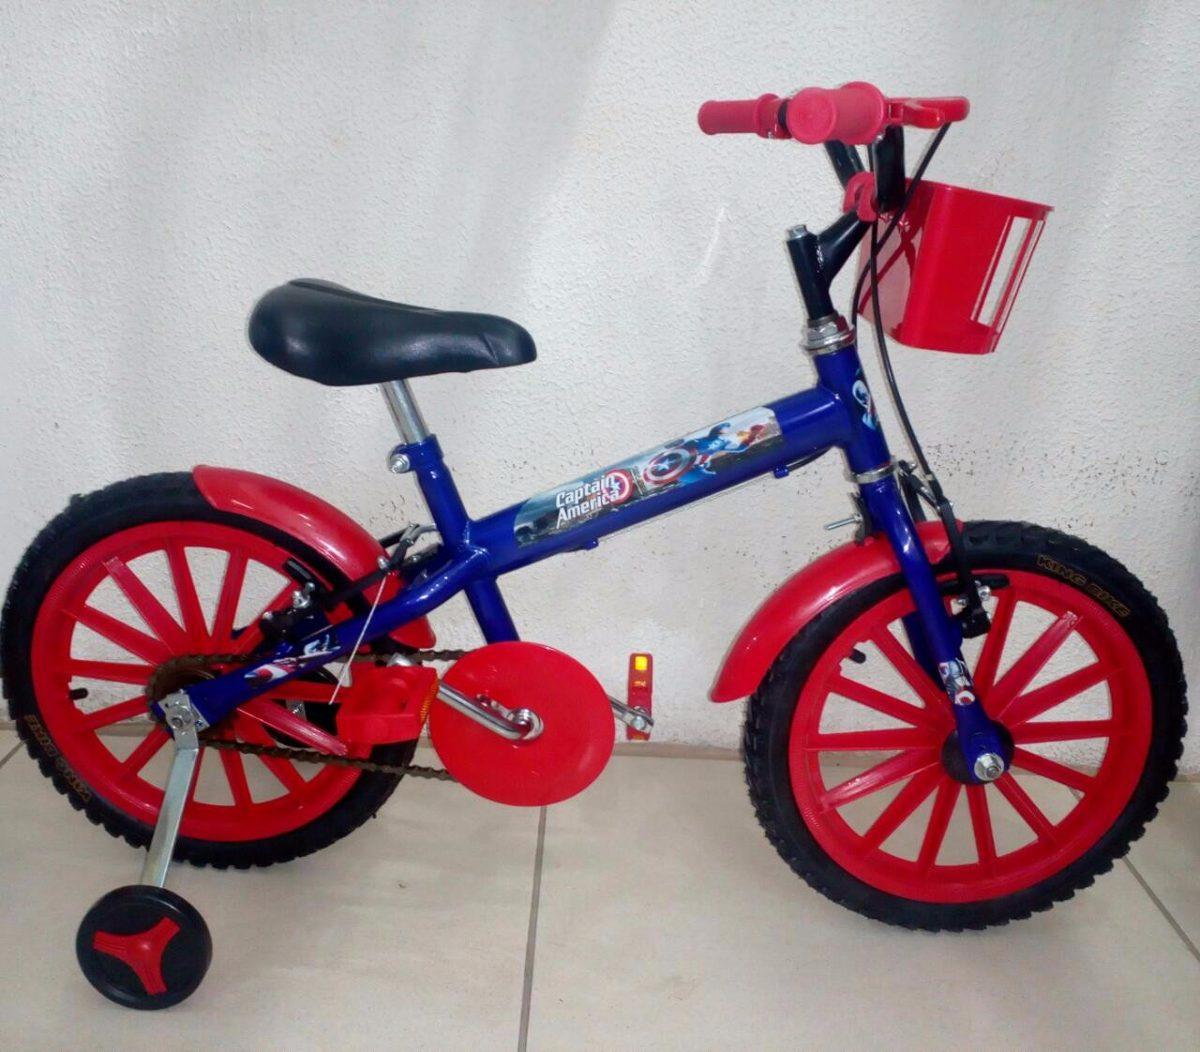 cdac4638b bicicleta infantil aro 16 masculino vip bikes (personagens). Carregando  zoom.